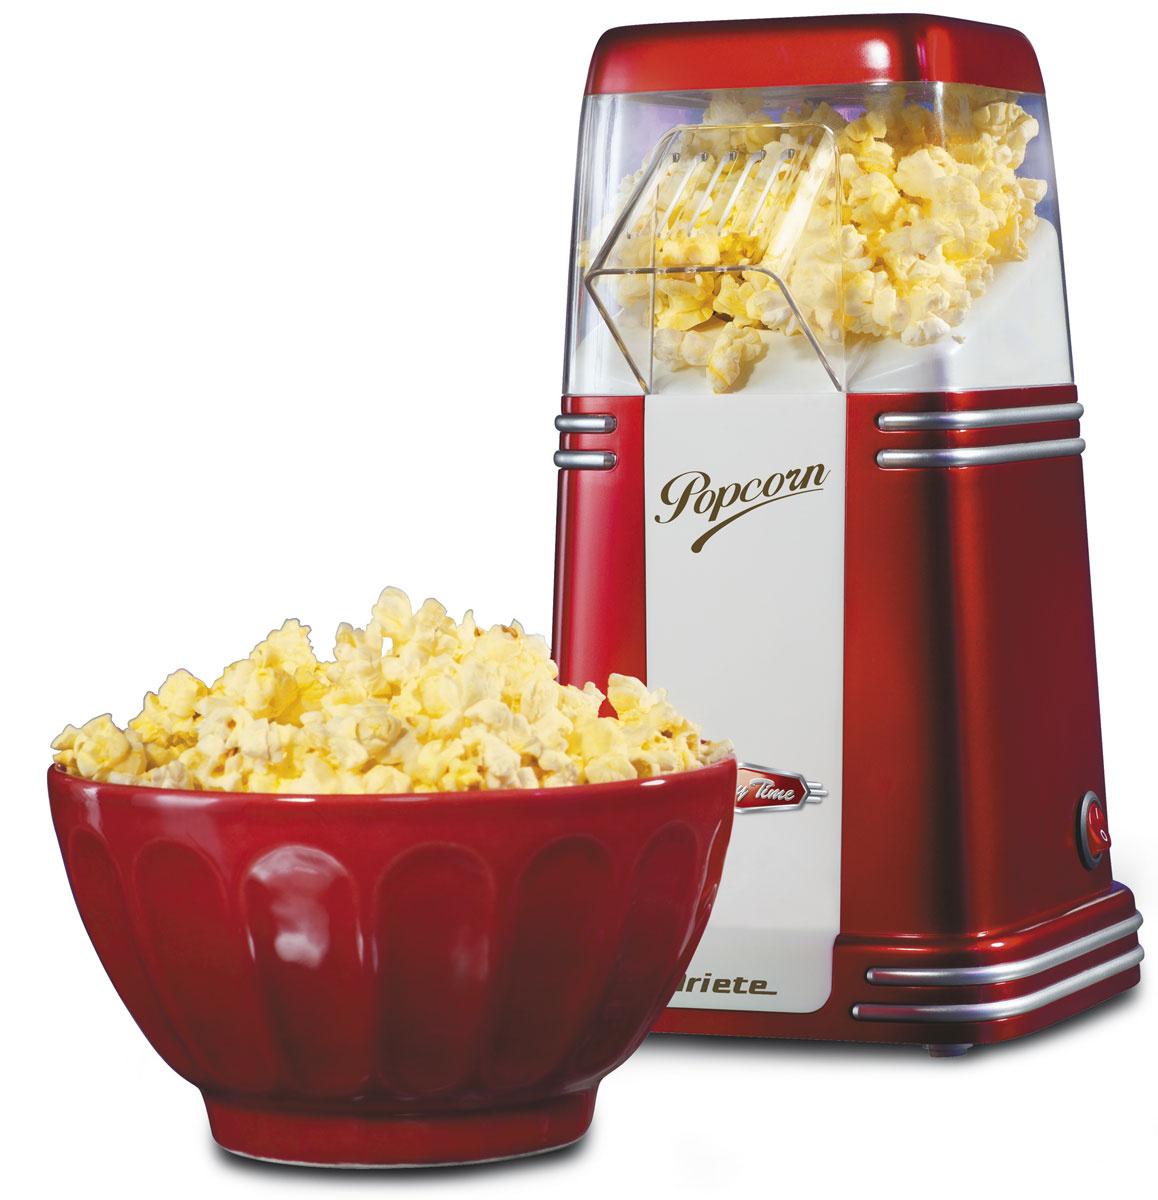 Попкорн мейкер Ariete Pop Corn Popper Party Time (2952) #1